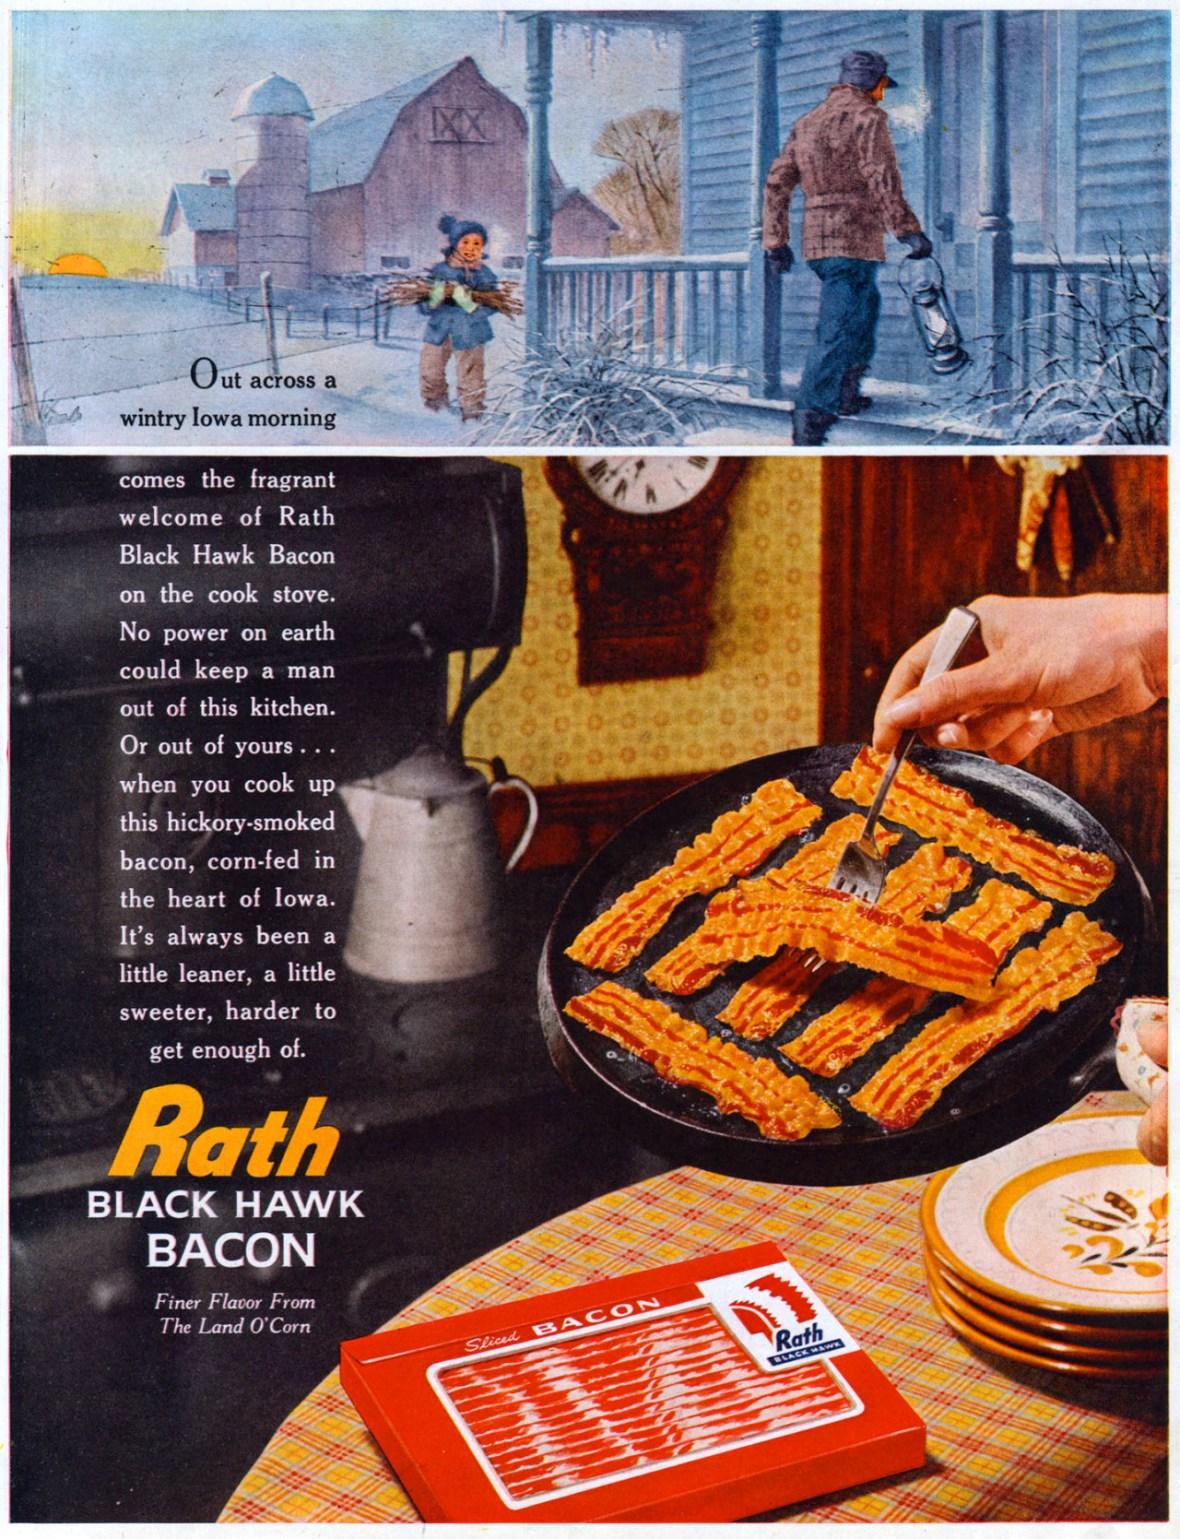 Rath Black Hawk Bacon - 1960